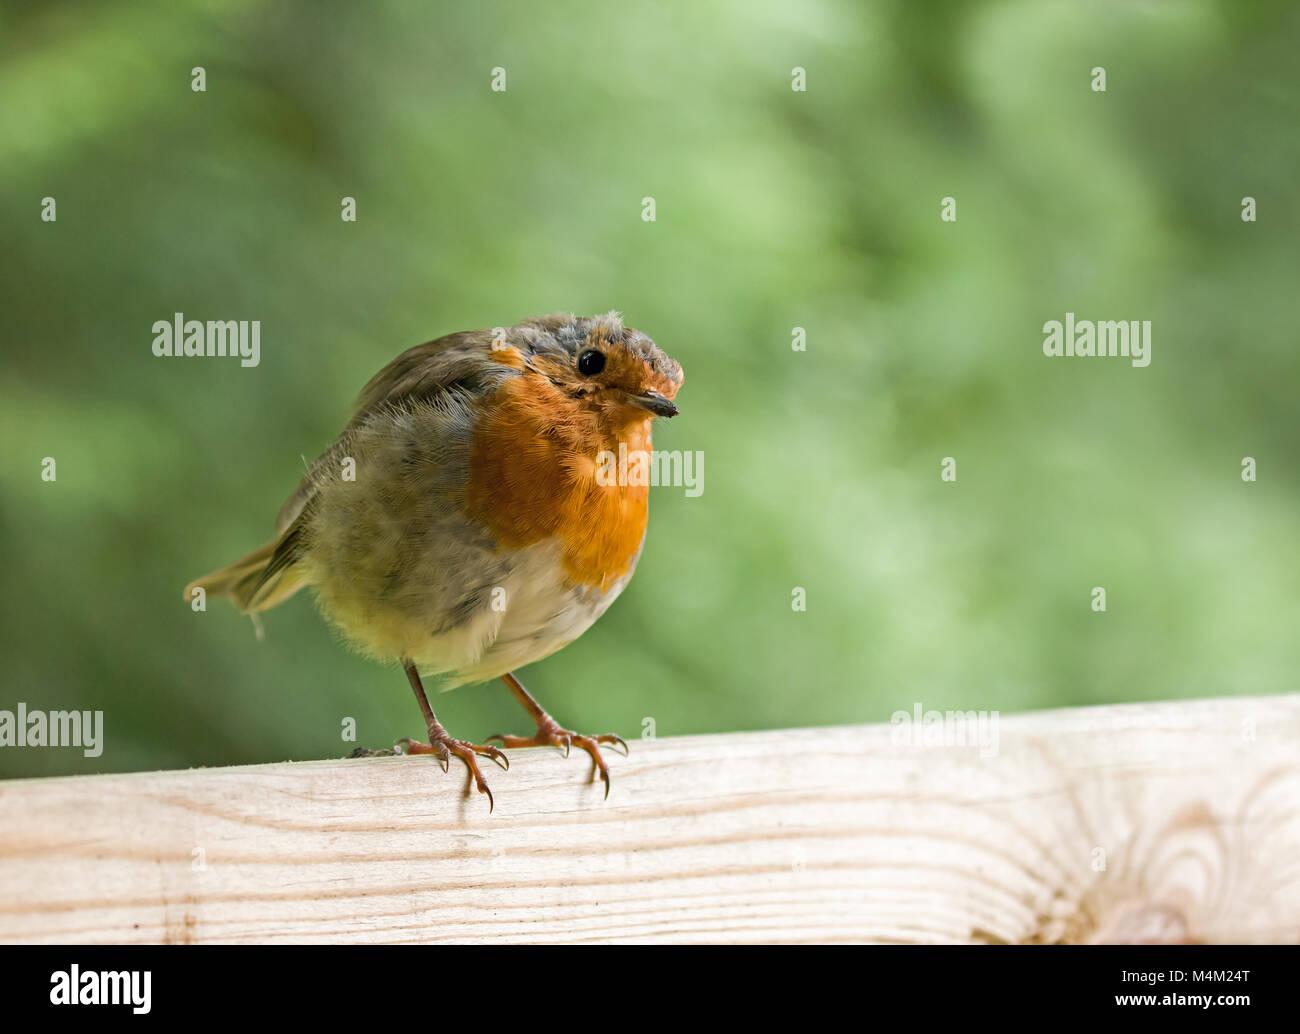 European Robin on Fence Head Tilted - Stock Image